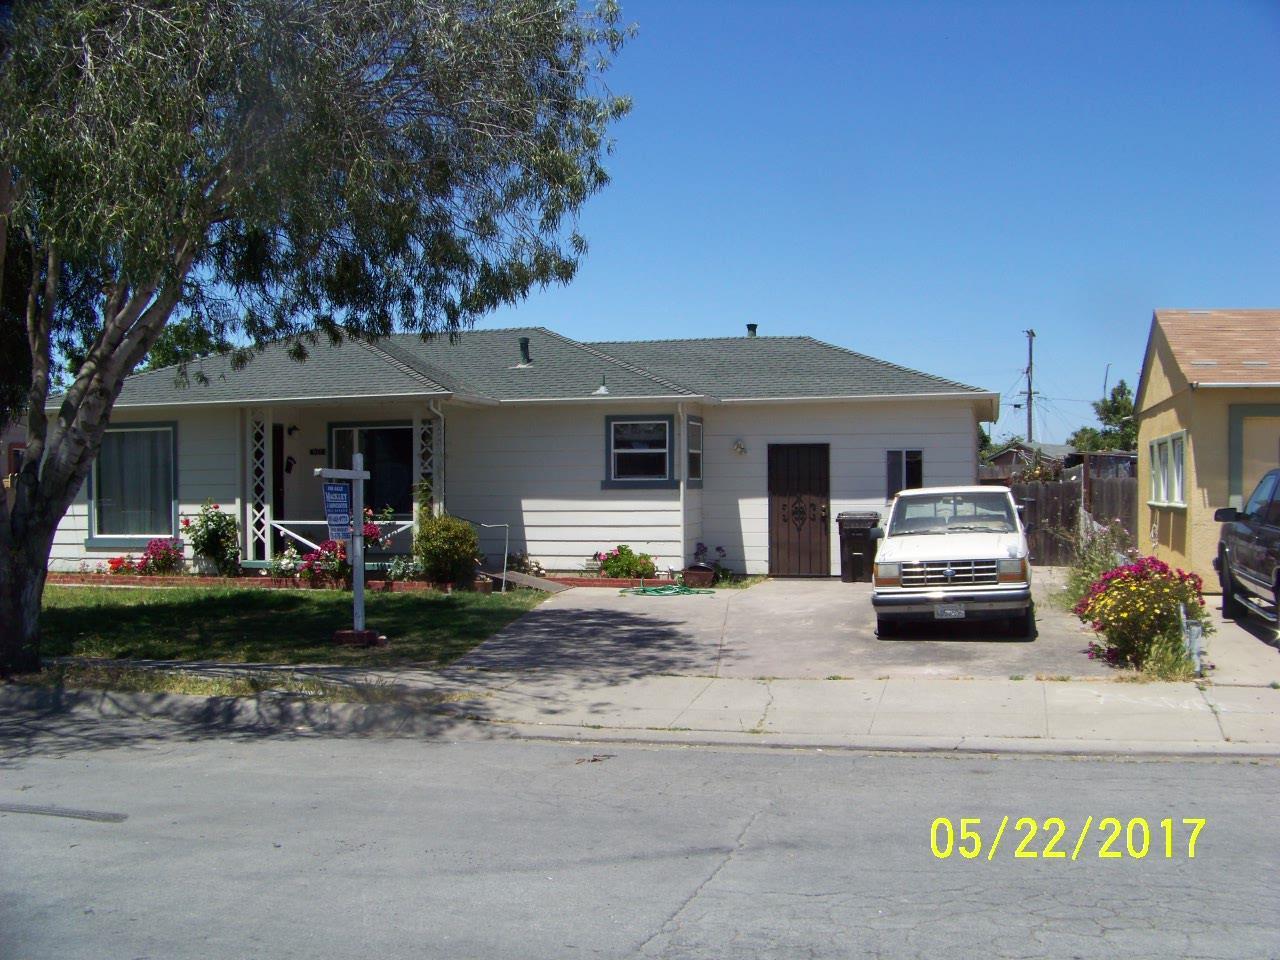 Additional photo for property listing at 917 Beech Street  Salinas, Kalifornien 93905 Vereinigte Staaten